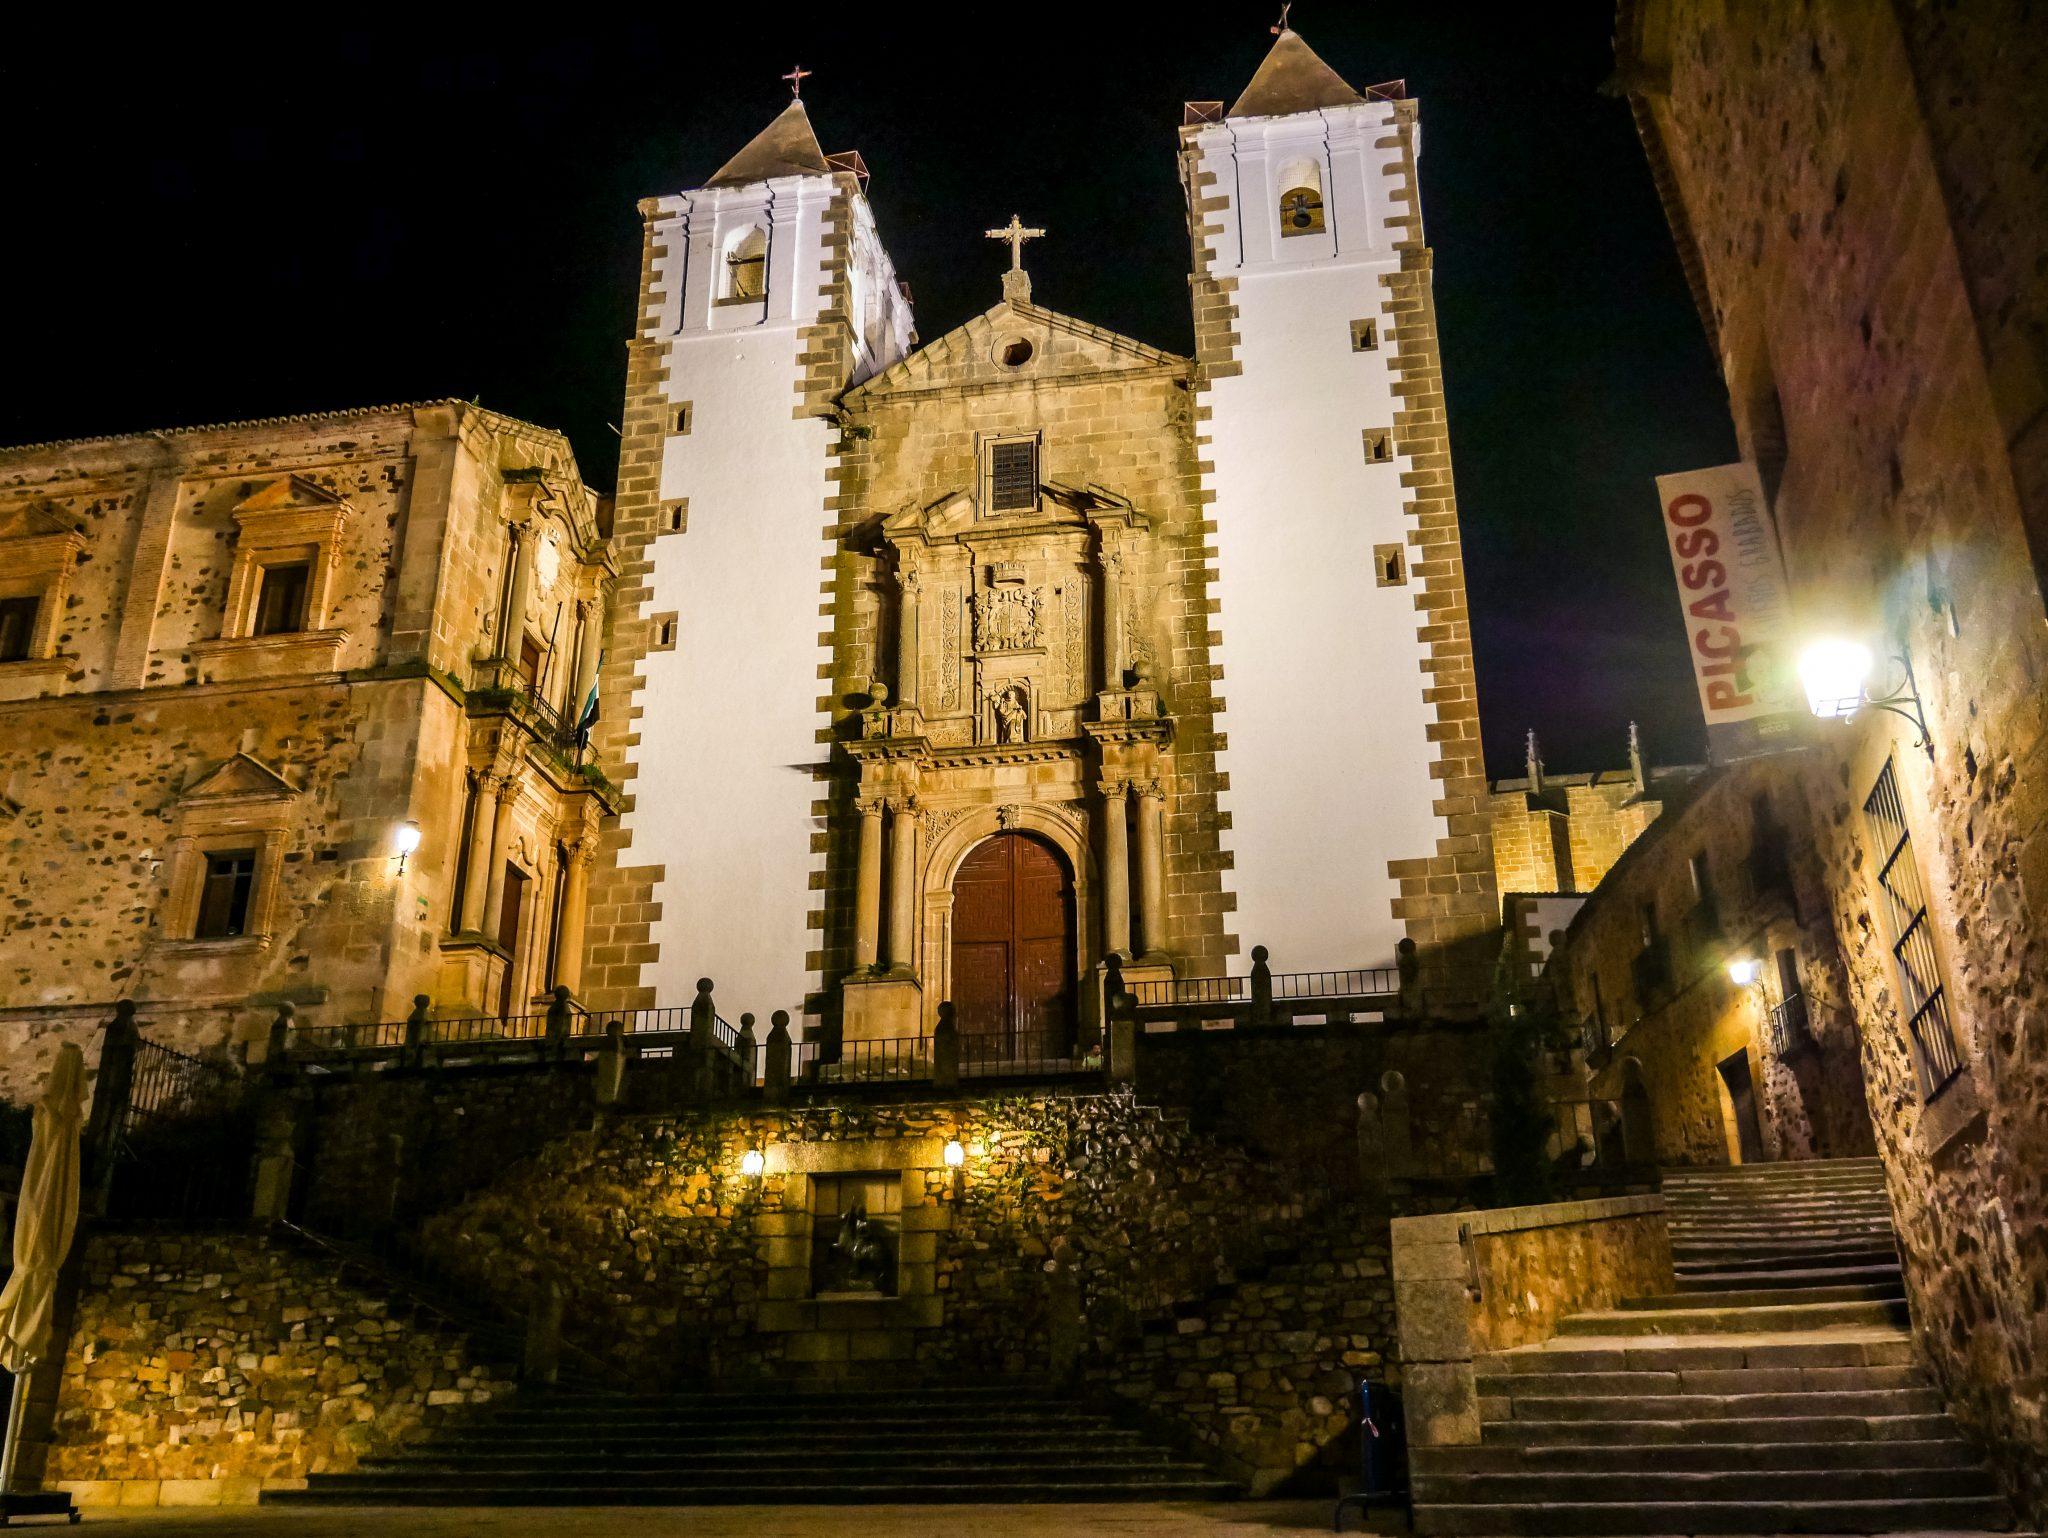 Besonders bei Nacht ist die Altstadt wie leergefegt. Hier: Platz vor der Iglesia de San Francisco Javier in Cáceres